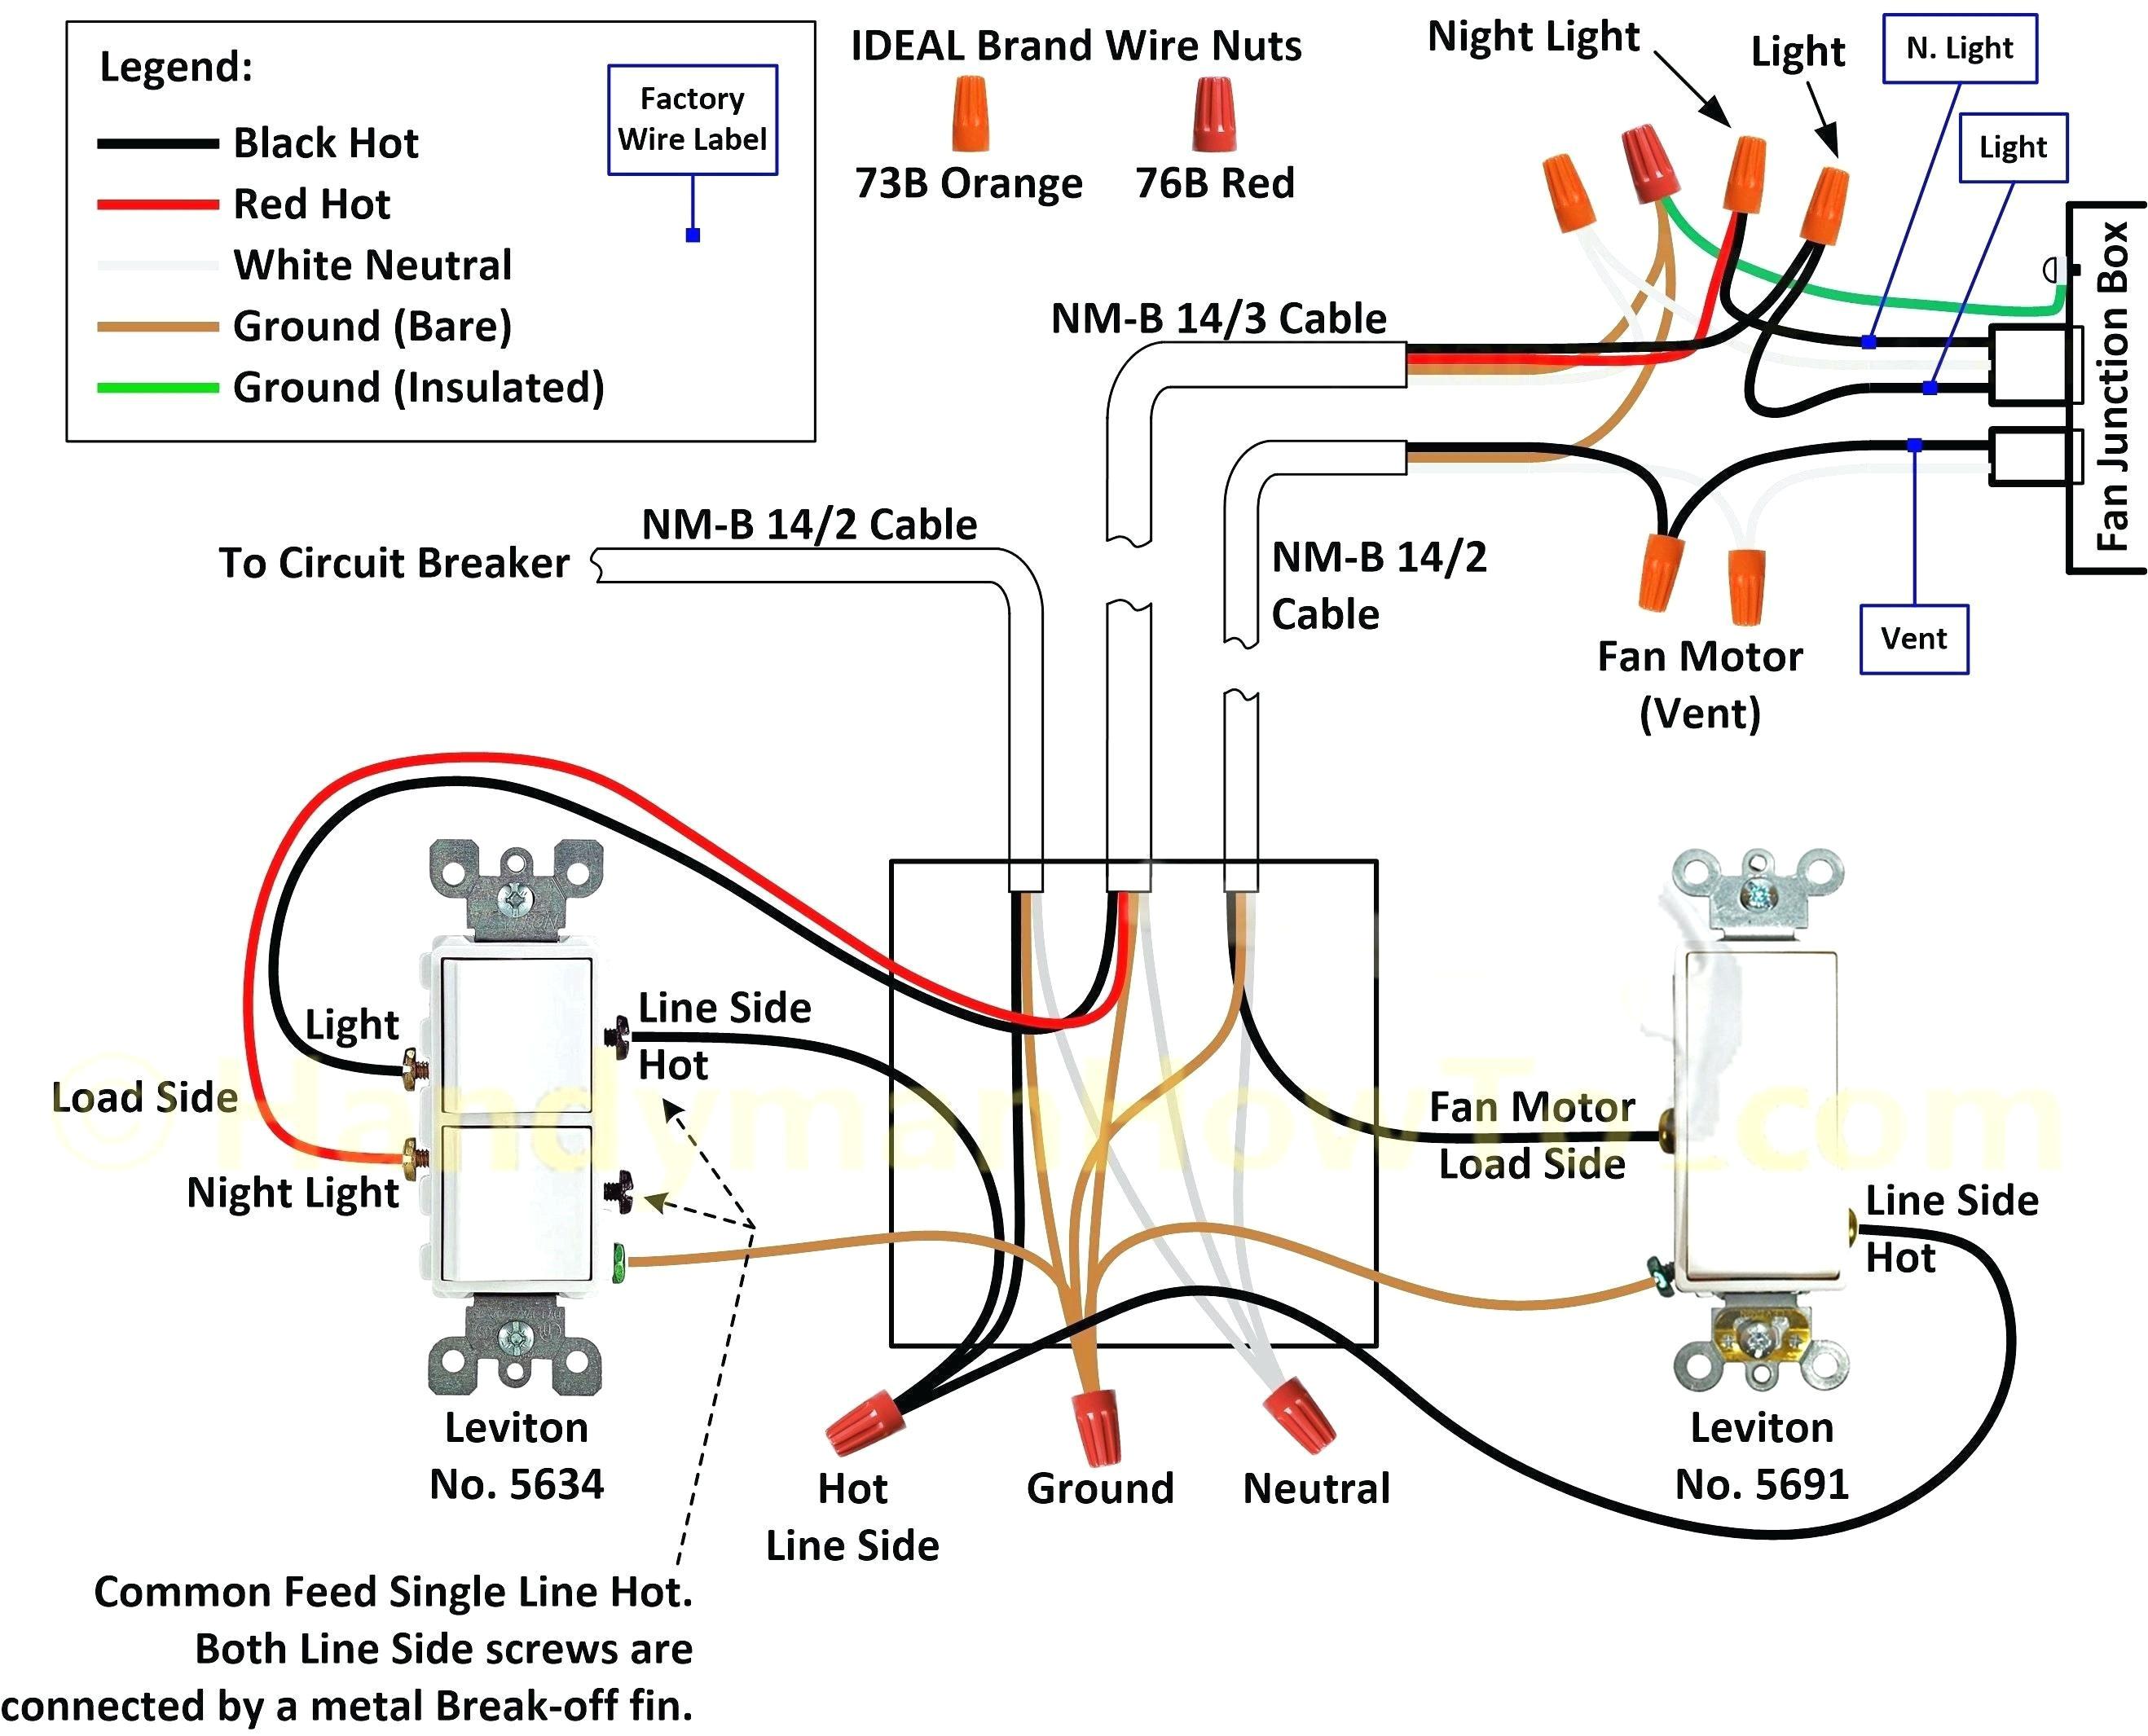 s2l lutron dimmer switch wiring diagram wiring diagram syss2l lutron dimmer switch wiring diagram wiring diagram